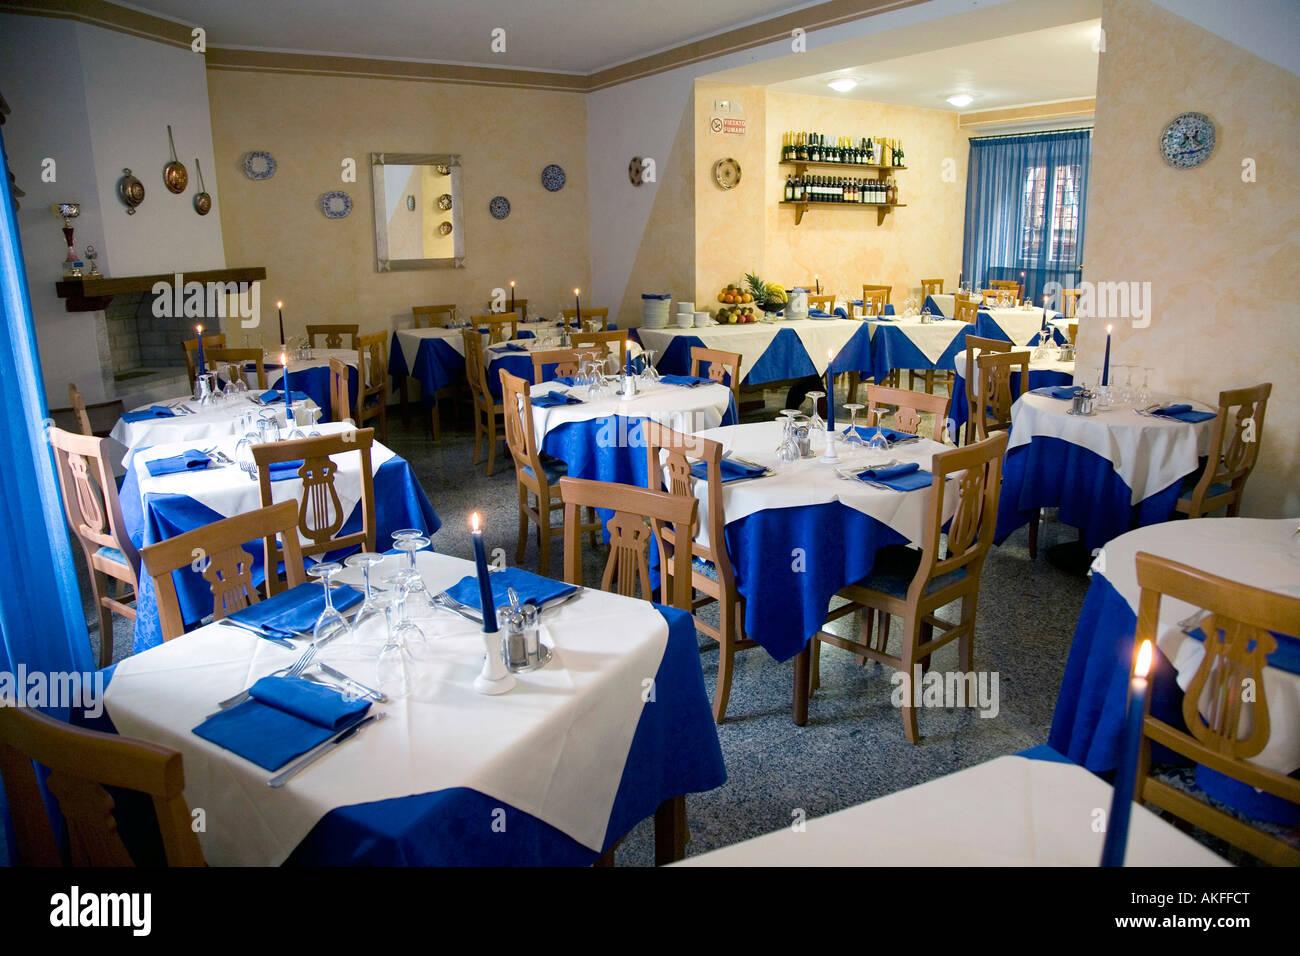 https://c8.alamy.com/compit/akffct/ristorante-antico-albergo-terme-hotel-terme-jean-varraud-spa-bagni-di-lucca-toscana-italia-akffct.jpg